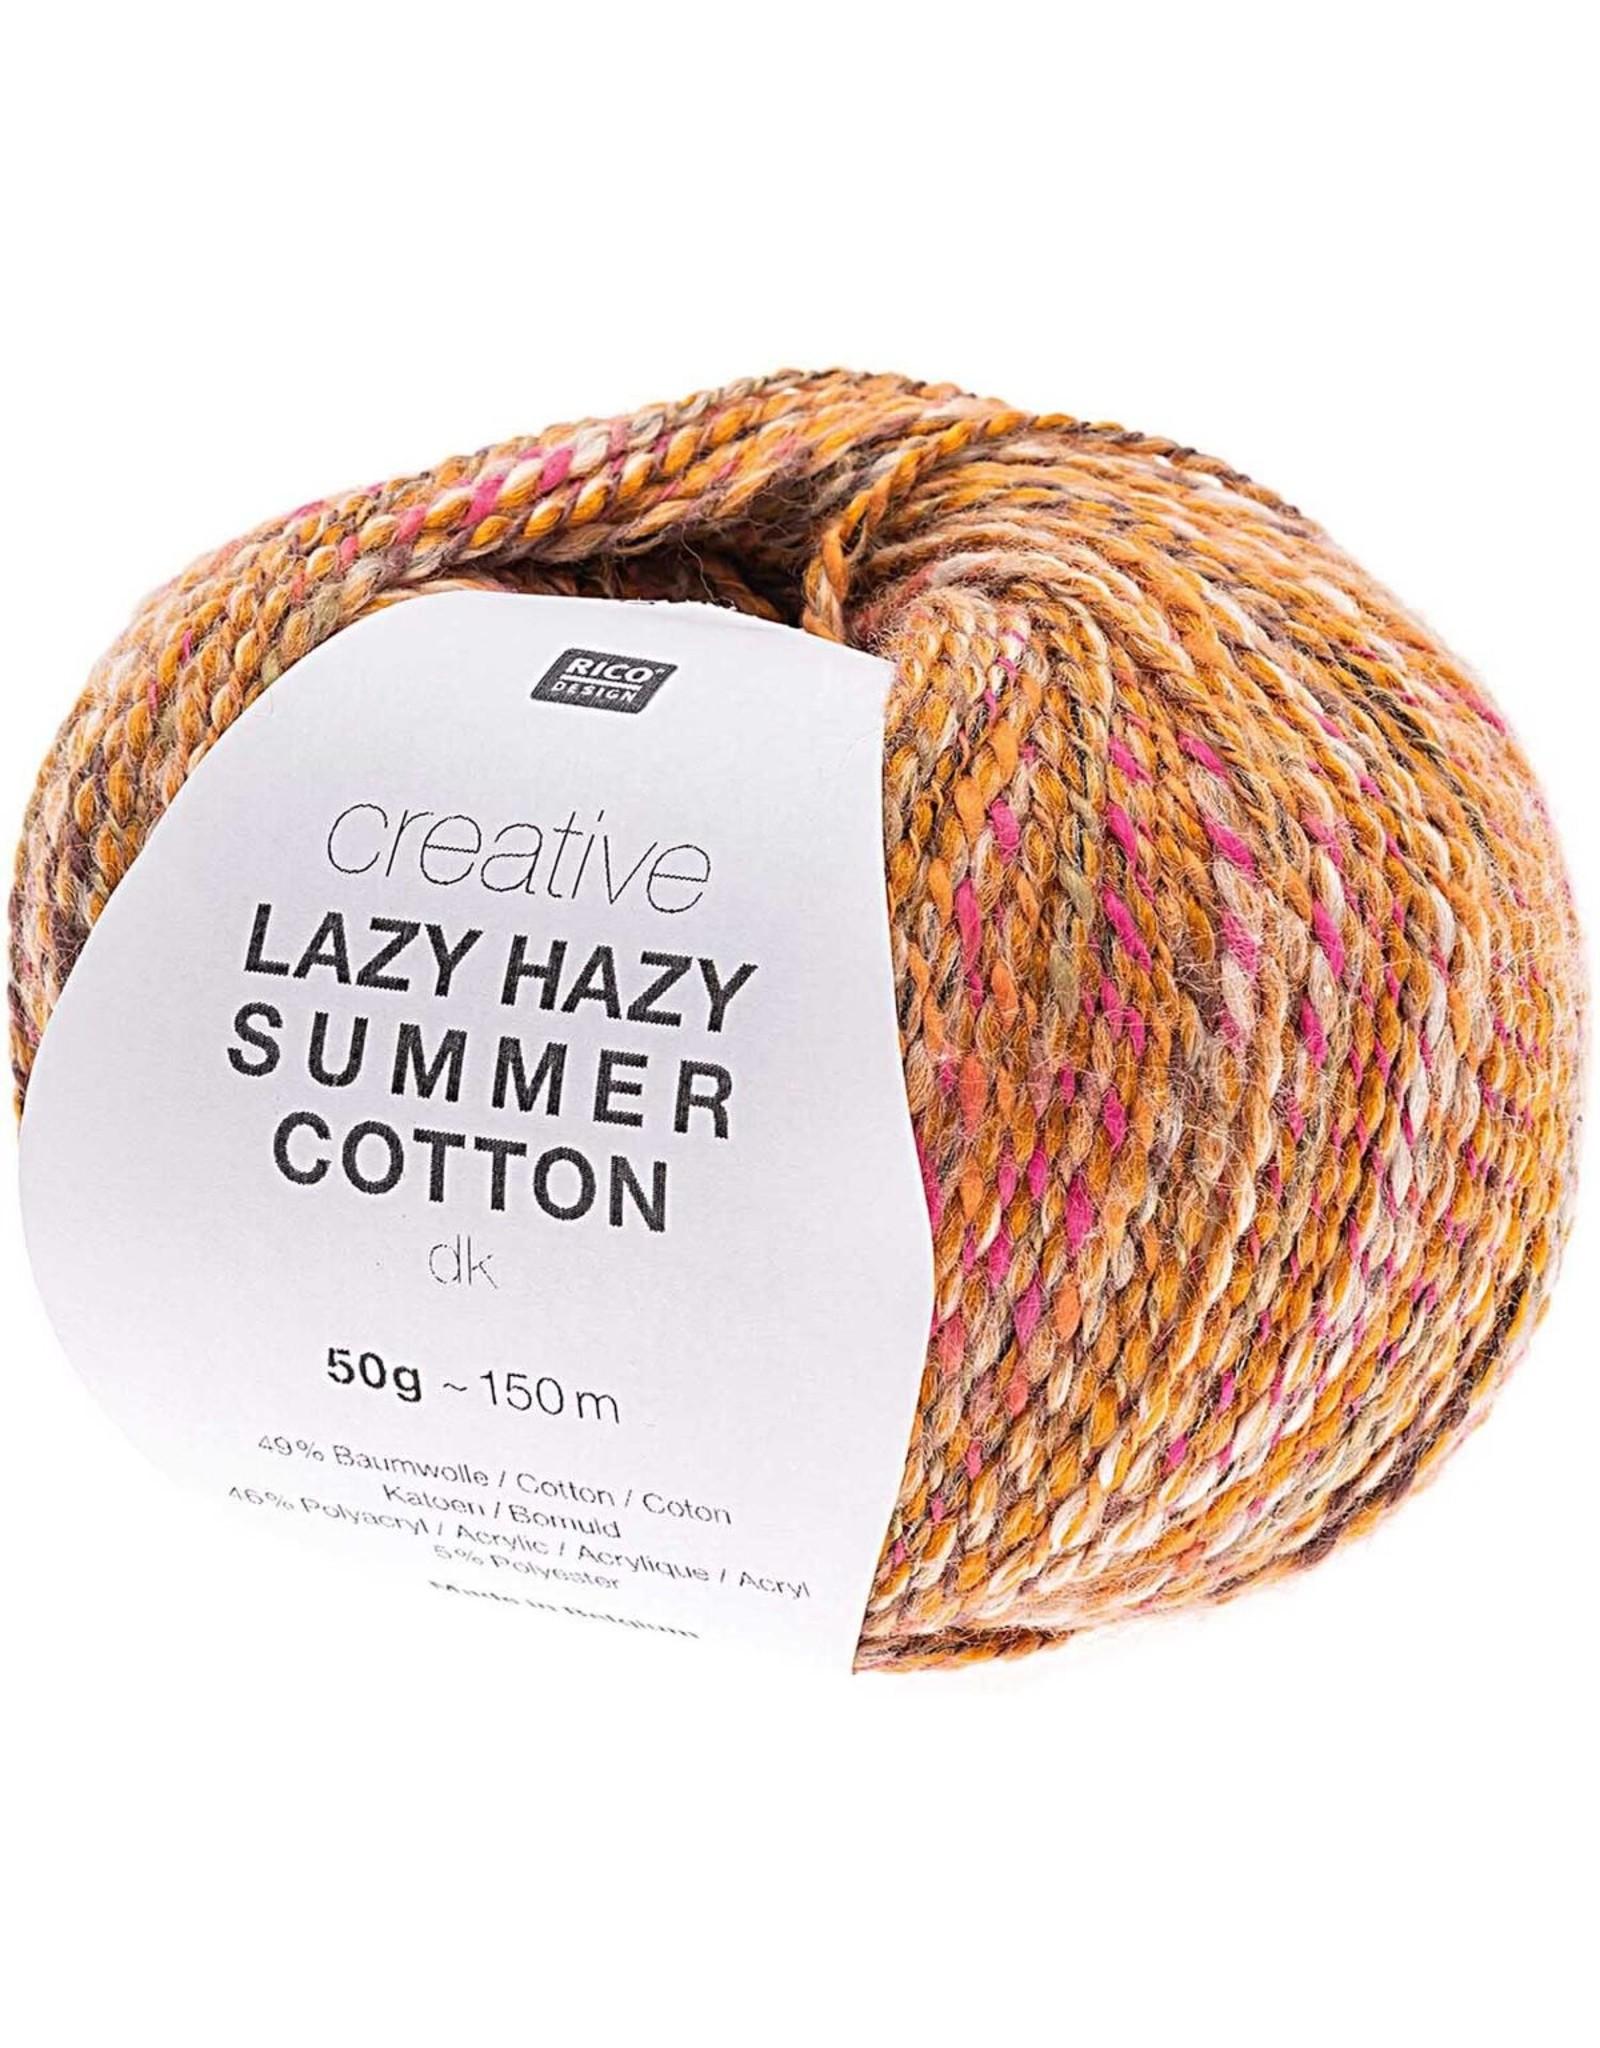 Rico Rico Creative Lazy Hazy Summer Cotton DK